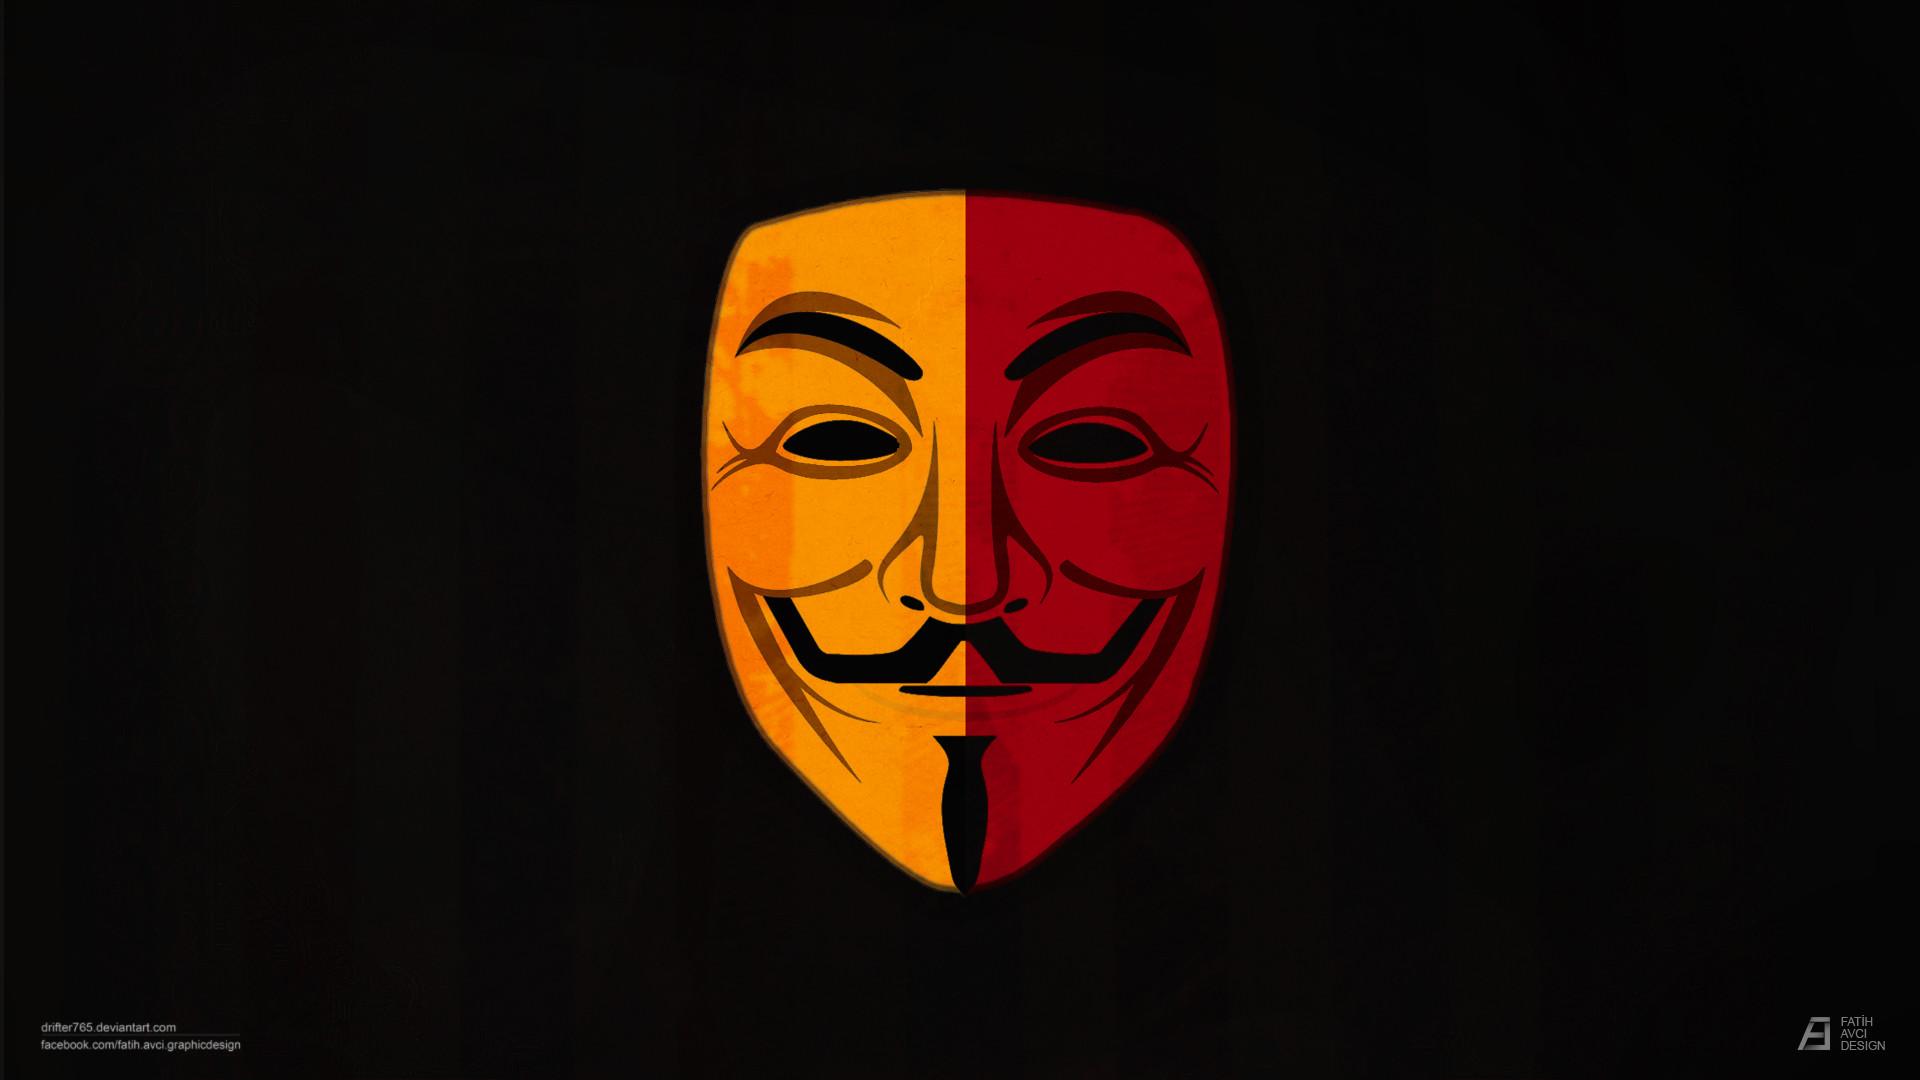 GS Vendetta Mask by drifter765 on DeviantArt | 1920 x 1080 jpeg 748kB ·  Anonymous Mask Wallpapers HD …